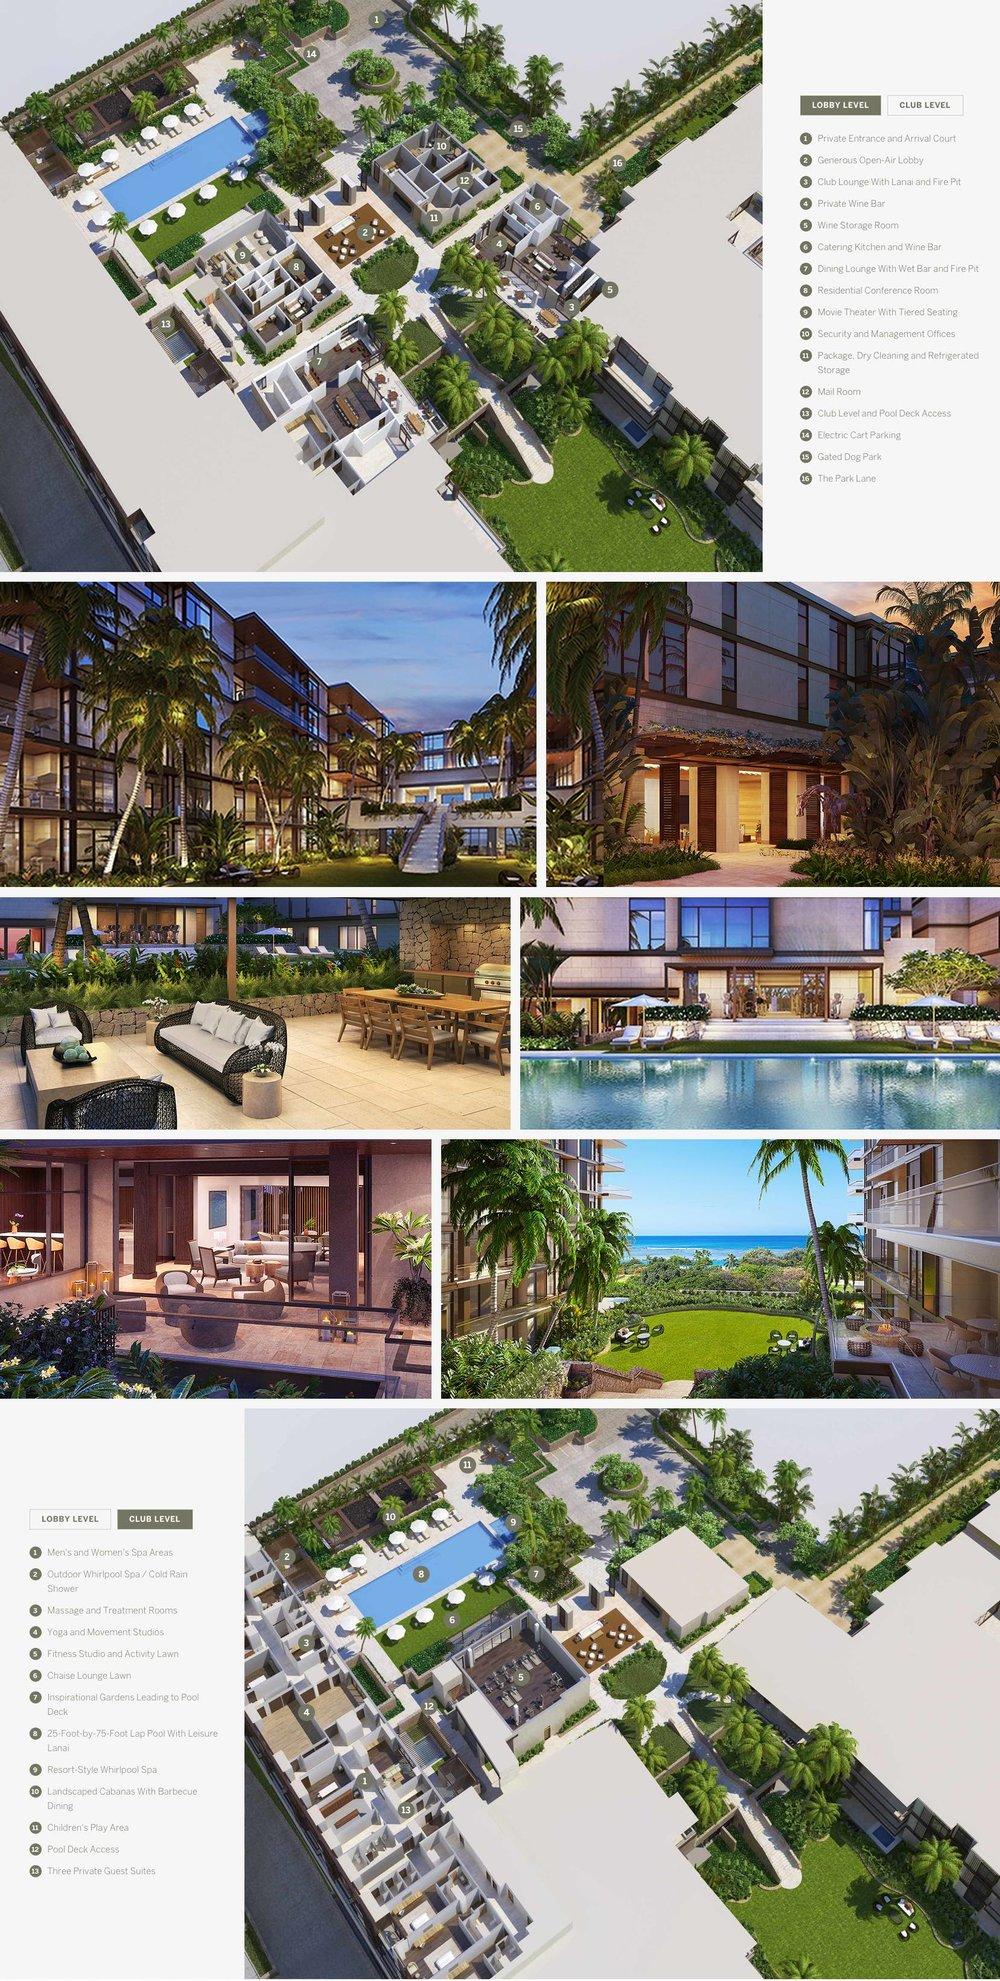 amenities_SM.jpg